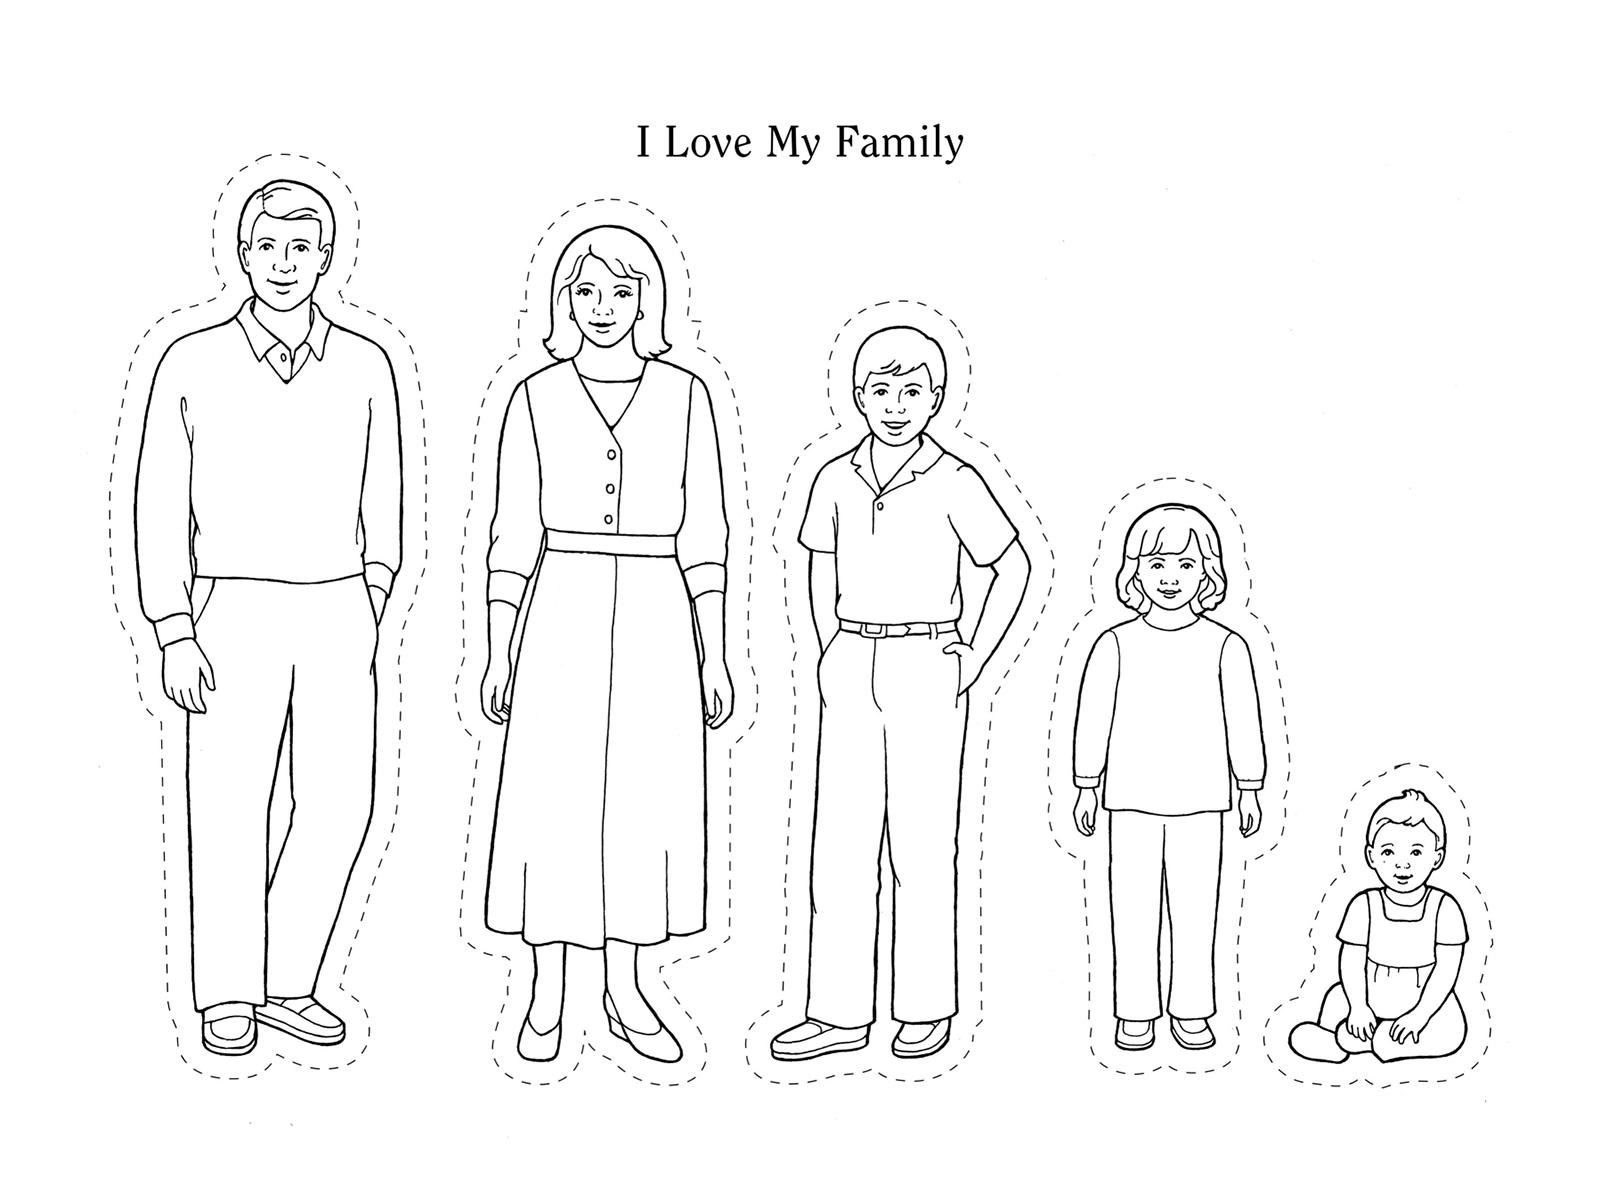 Nursery Manual Page 51: I Love My Family